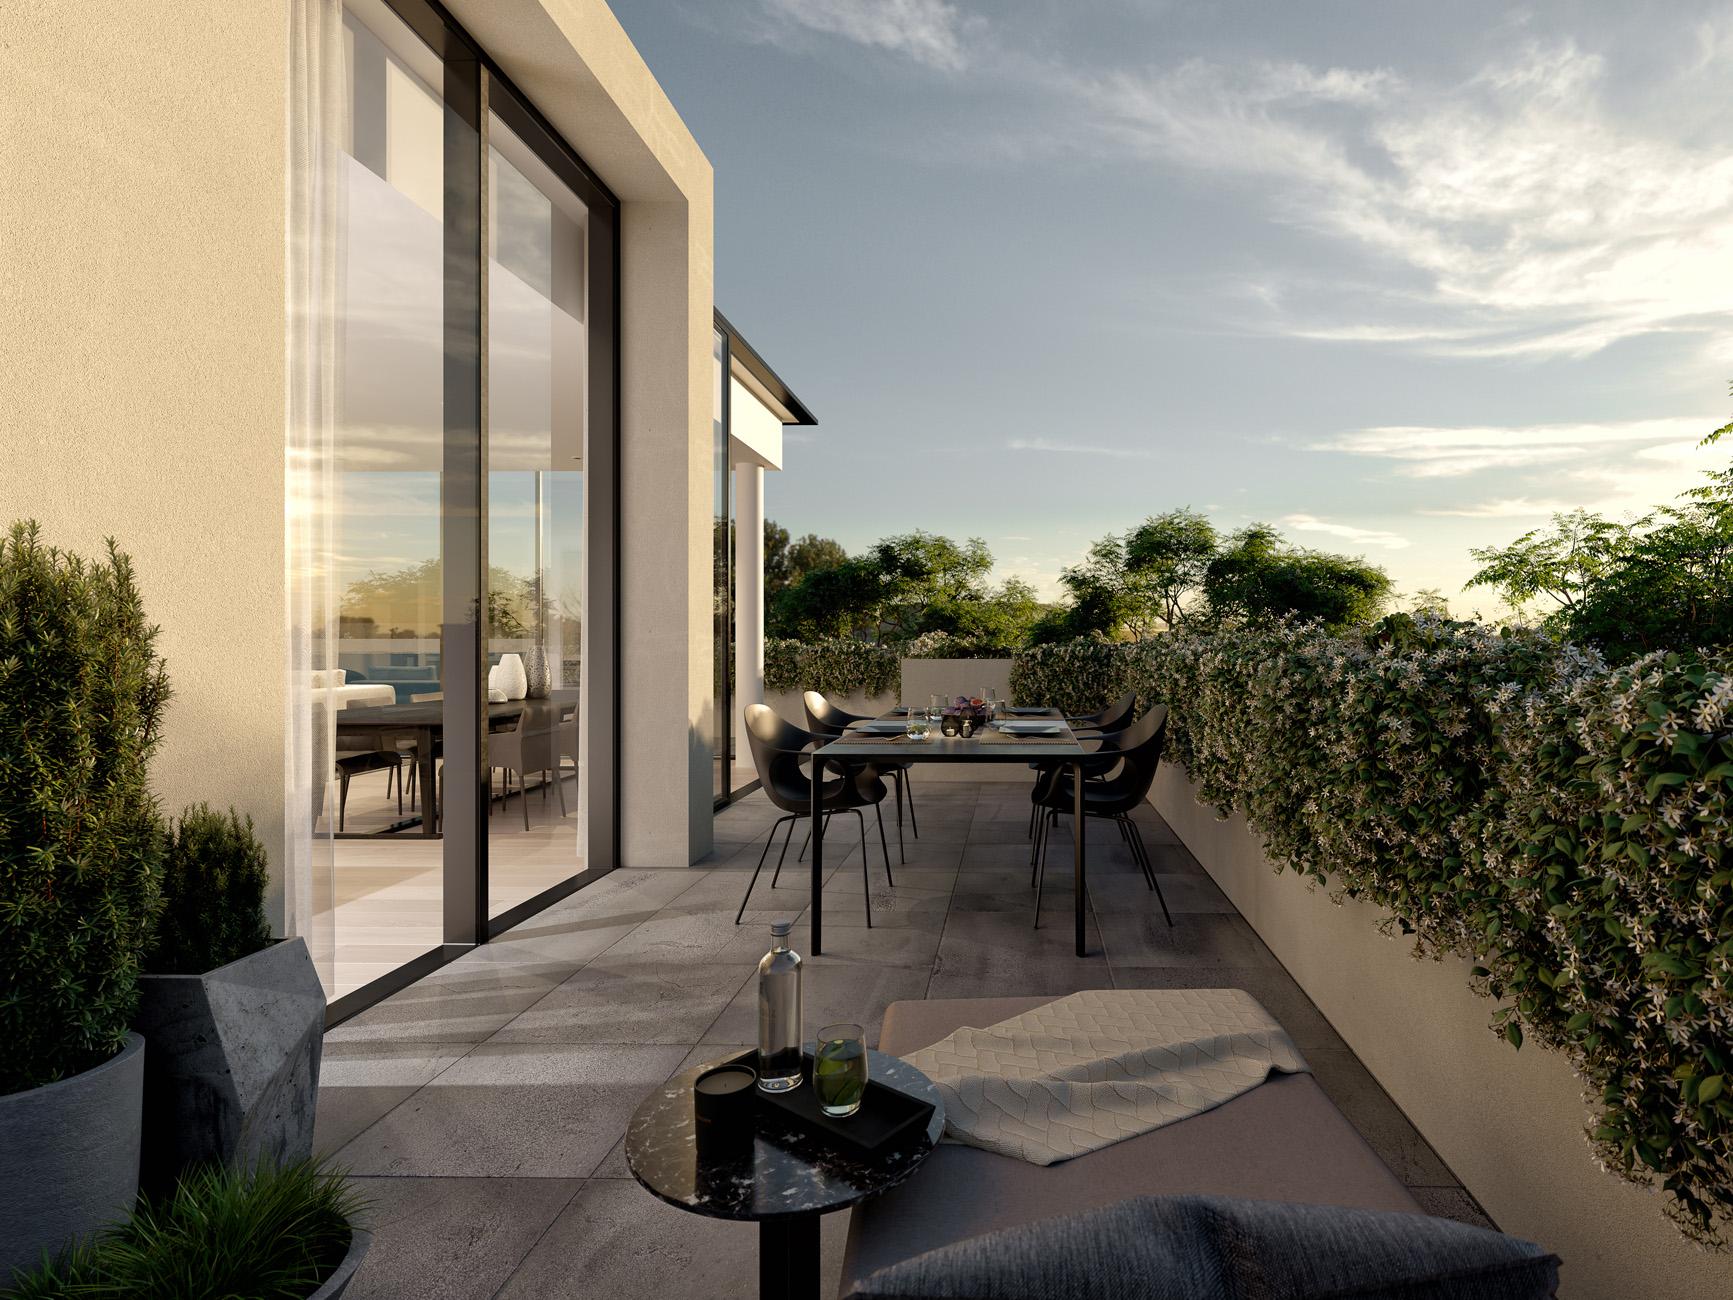 Trentham-House-penthouse-sandringham-Melbourne-3d-image-visualisation